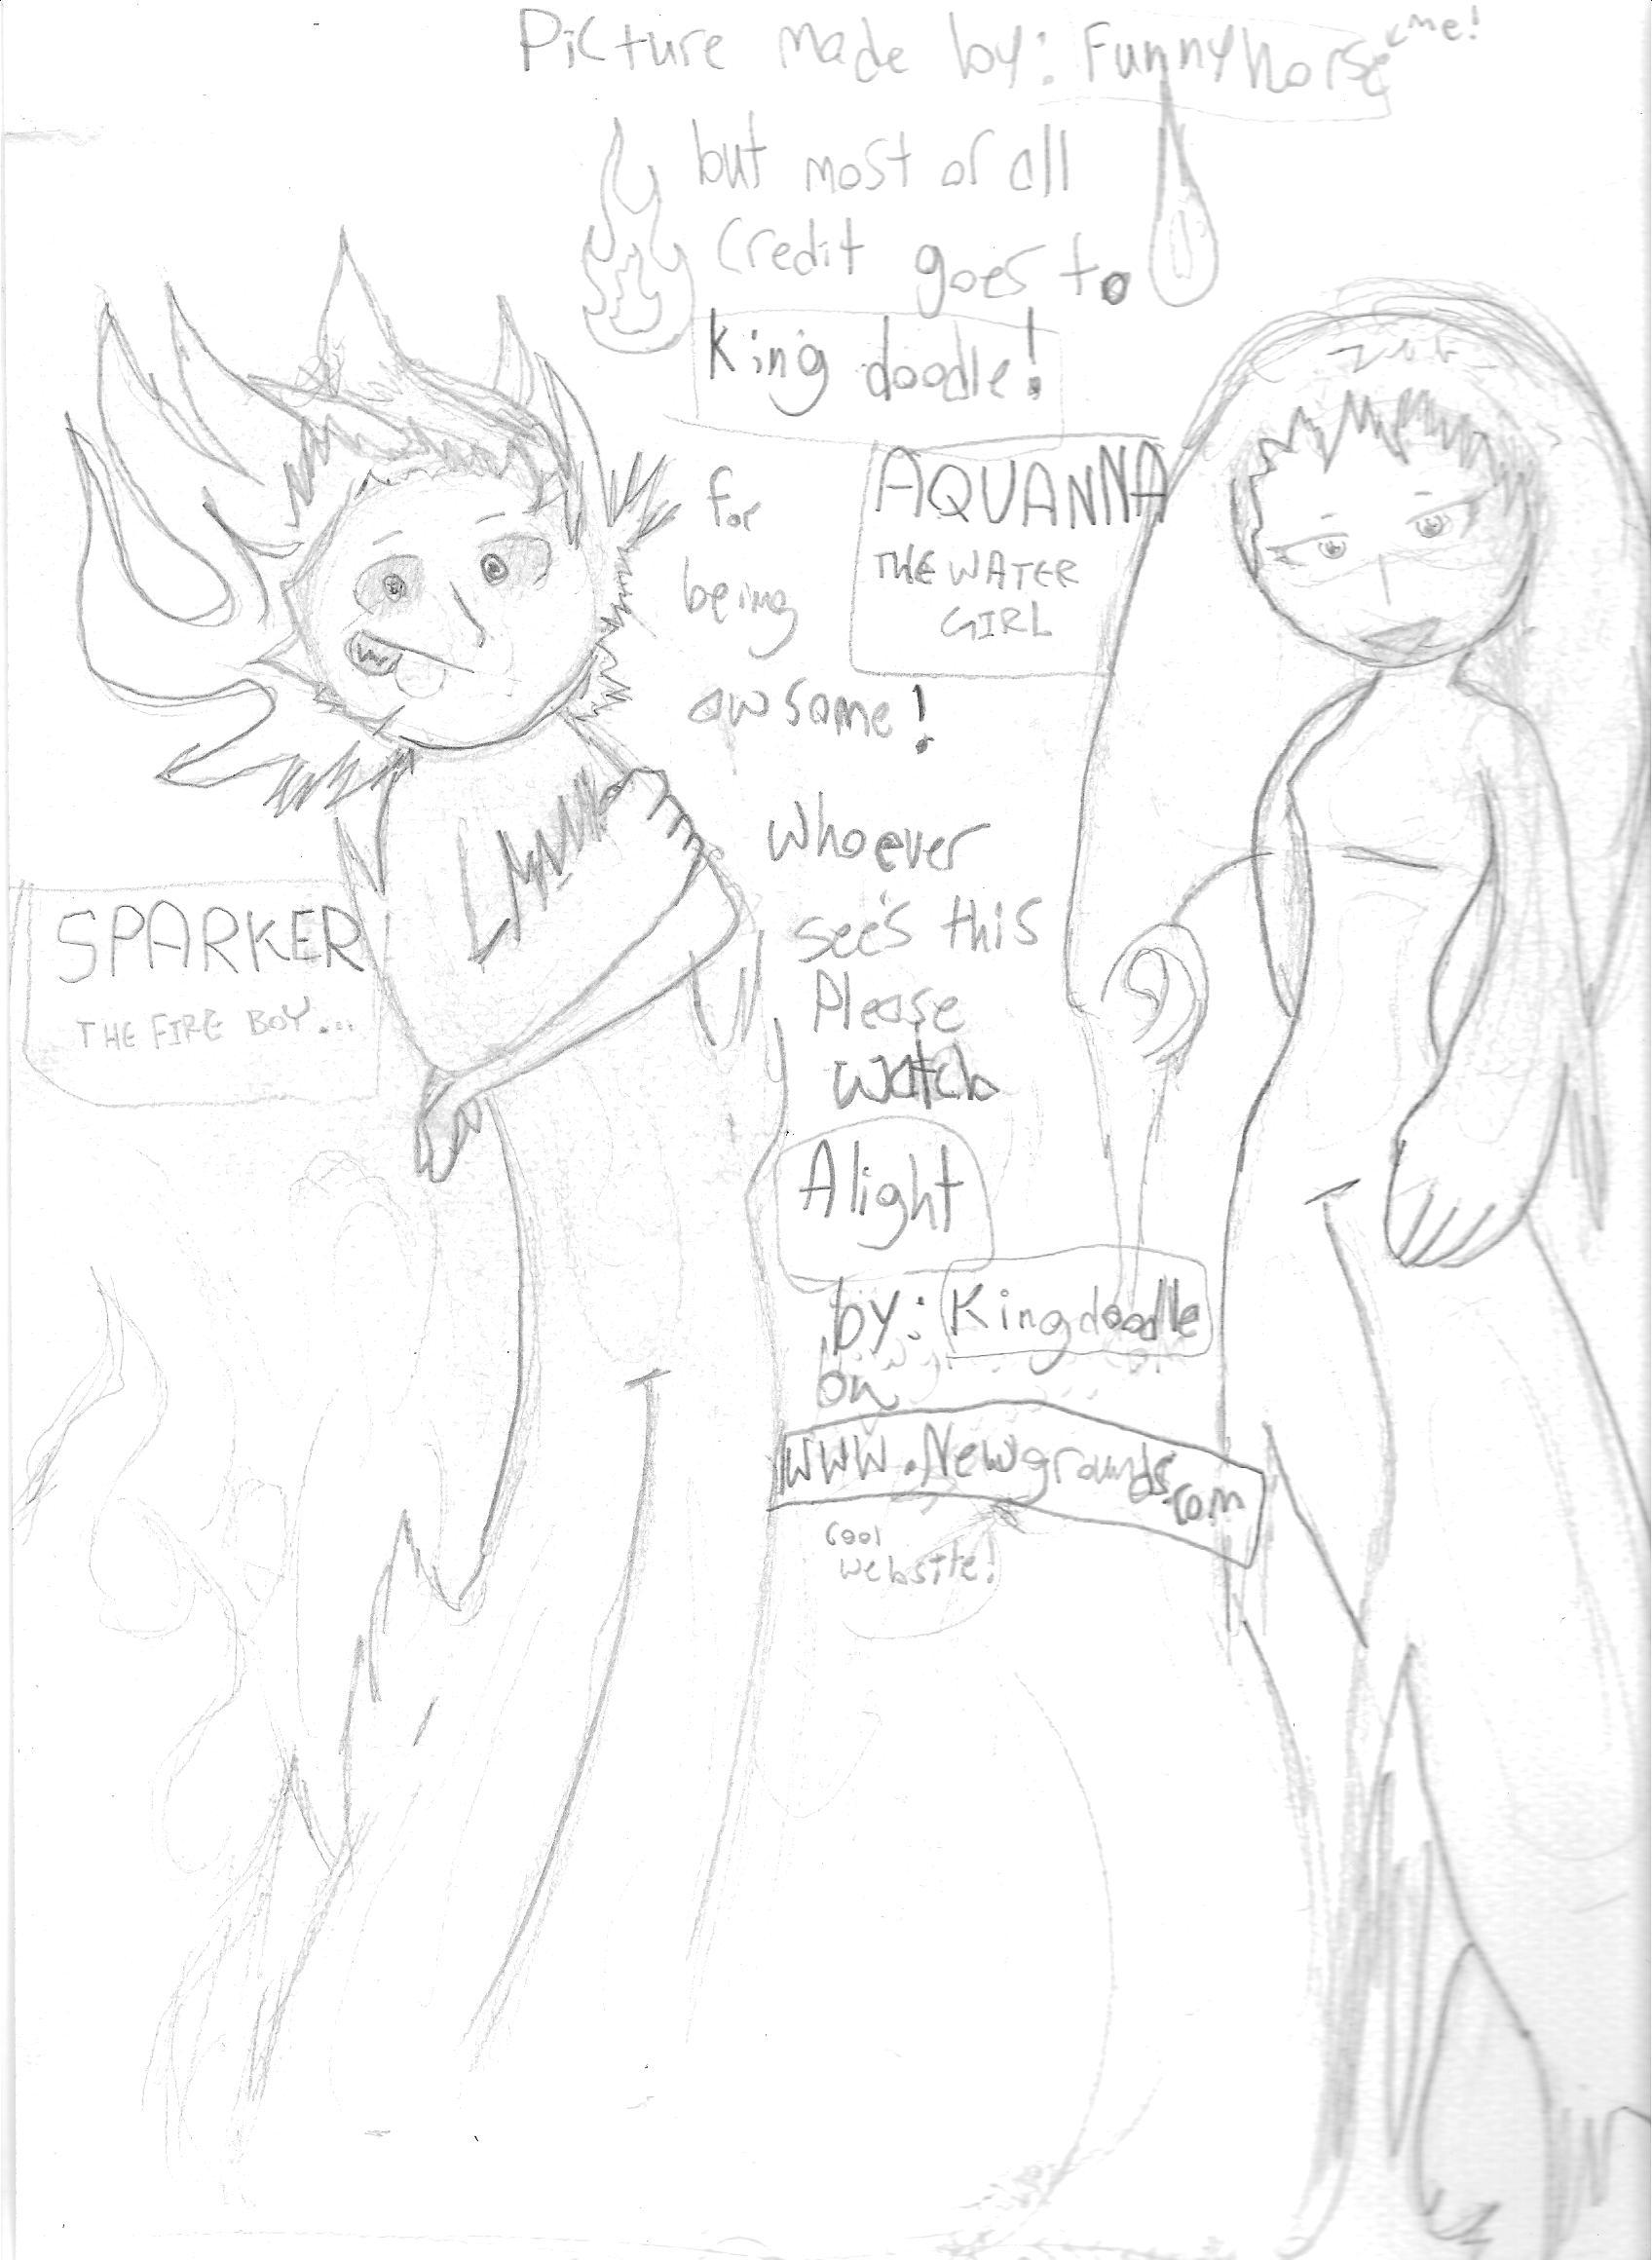 Aquanna and Sparker!